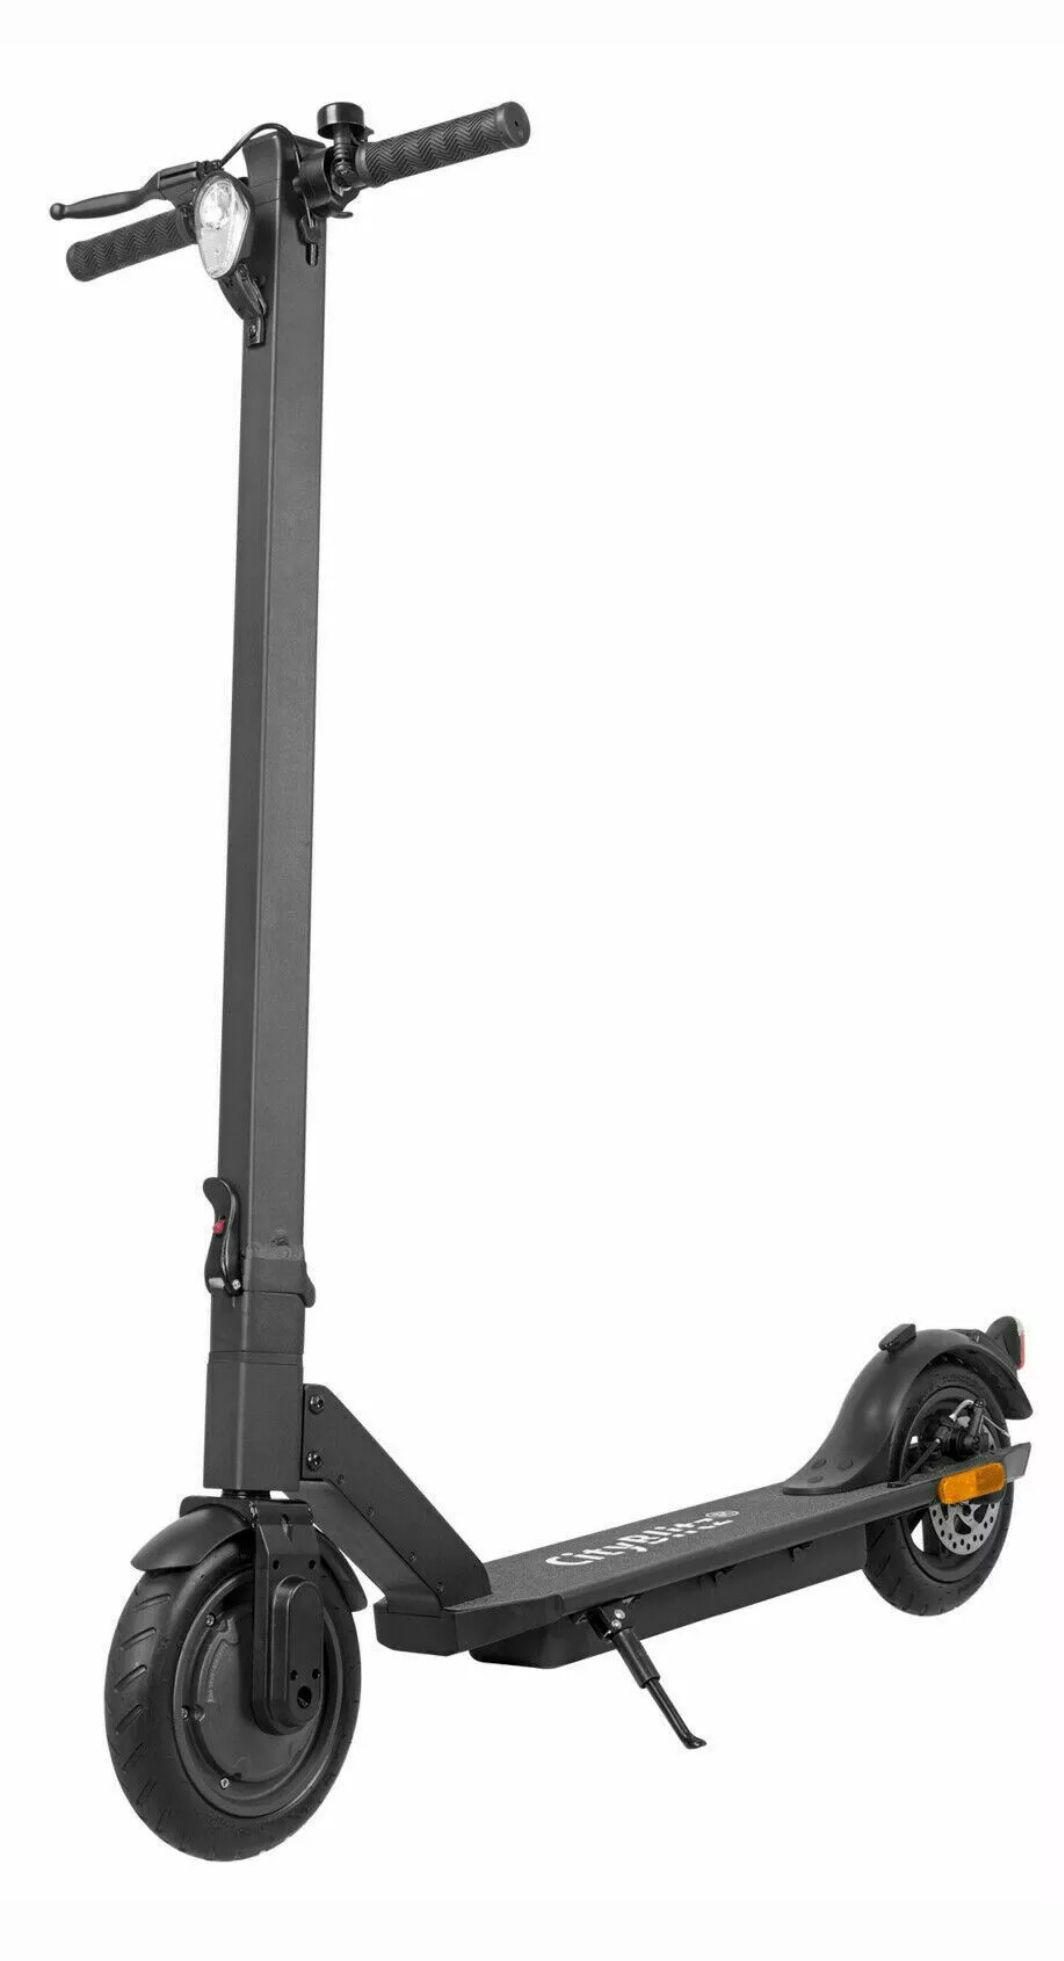 cityblitz cb064 moove e scooter mit zulassung. Black Bedroom Furniture Sets. Home Design Ideas